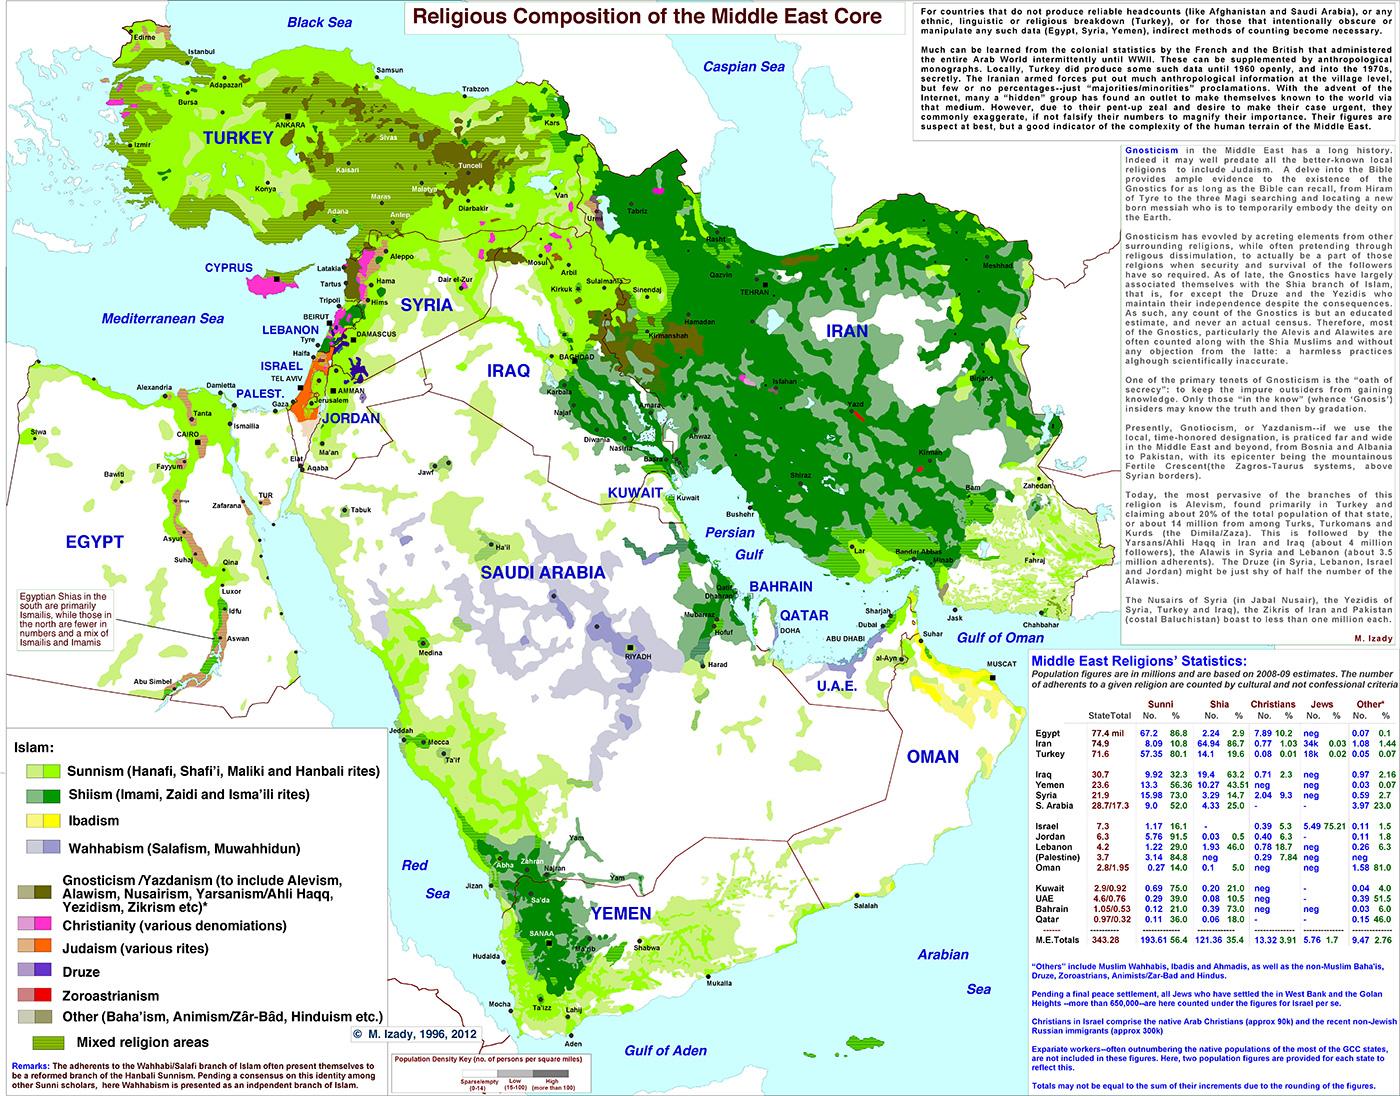 MidEastReligion